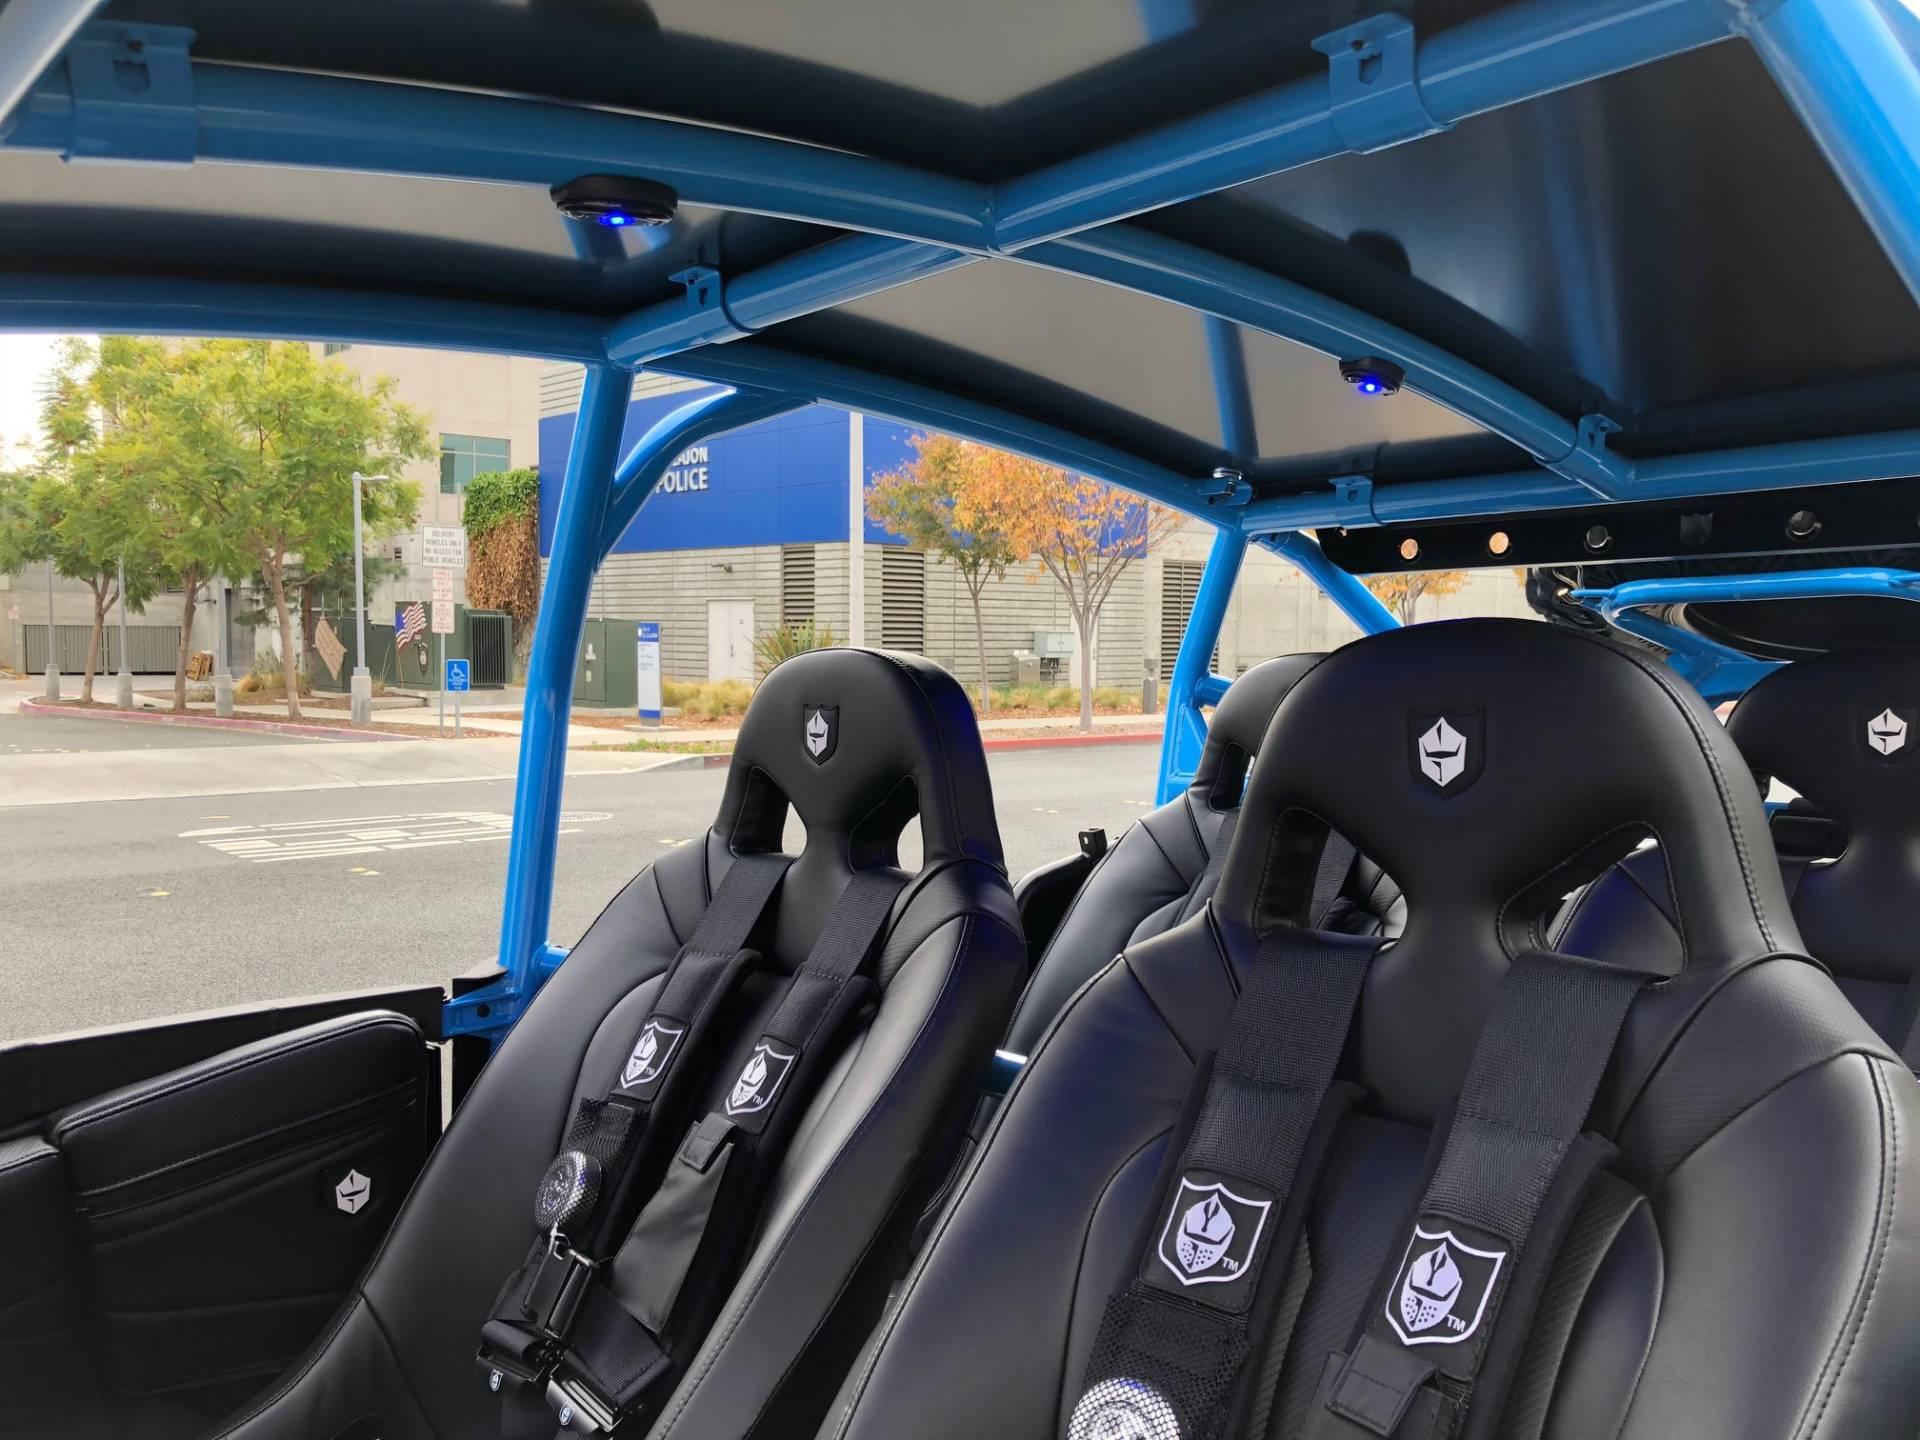 New 2019 Polaris RZR XP 4 Turbo   Utility Vehicles in EL